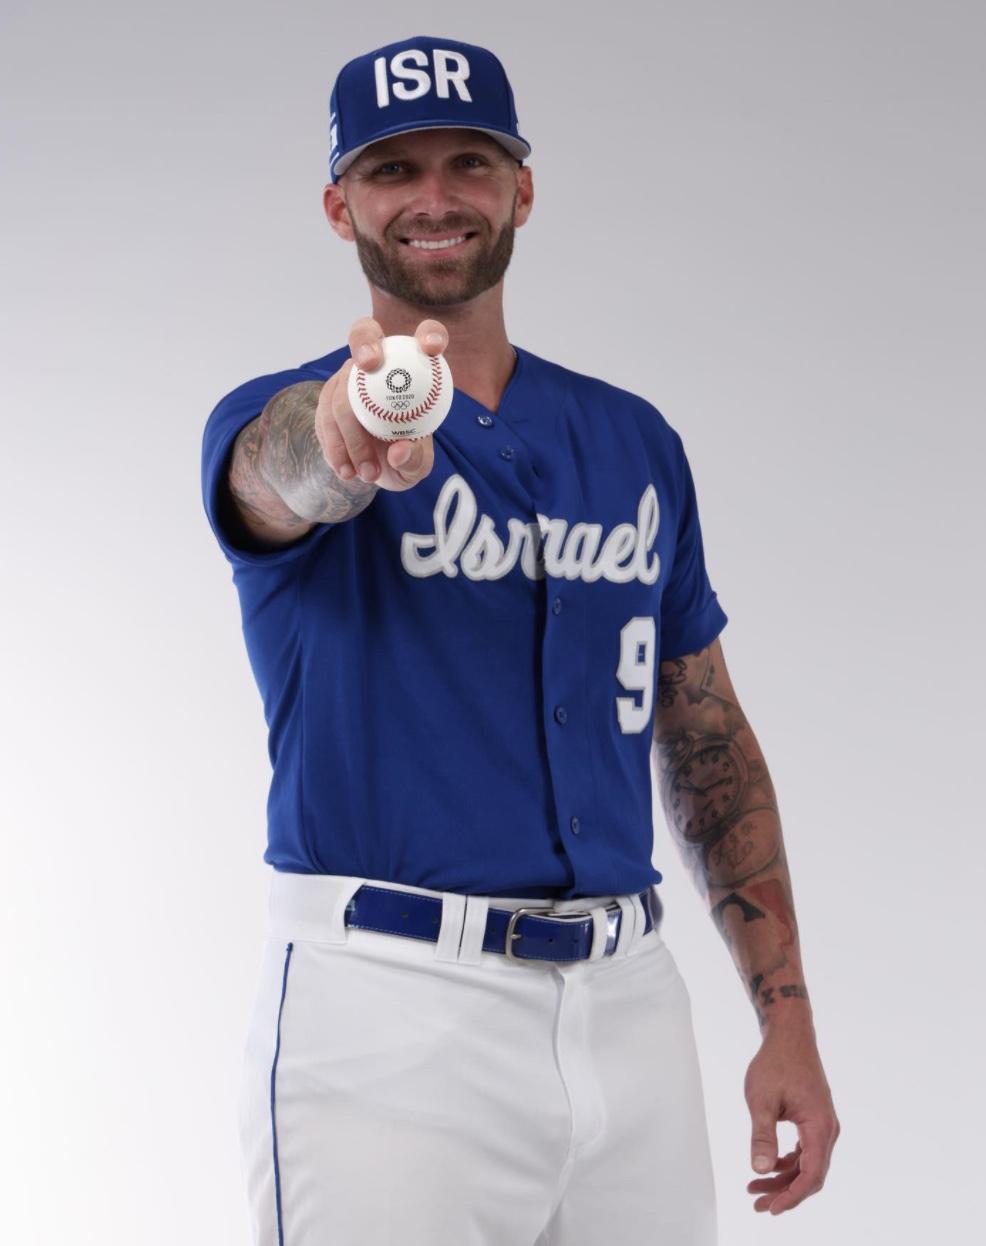 Nick Rickles in Israel baseball uniform holding a baseball.